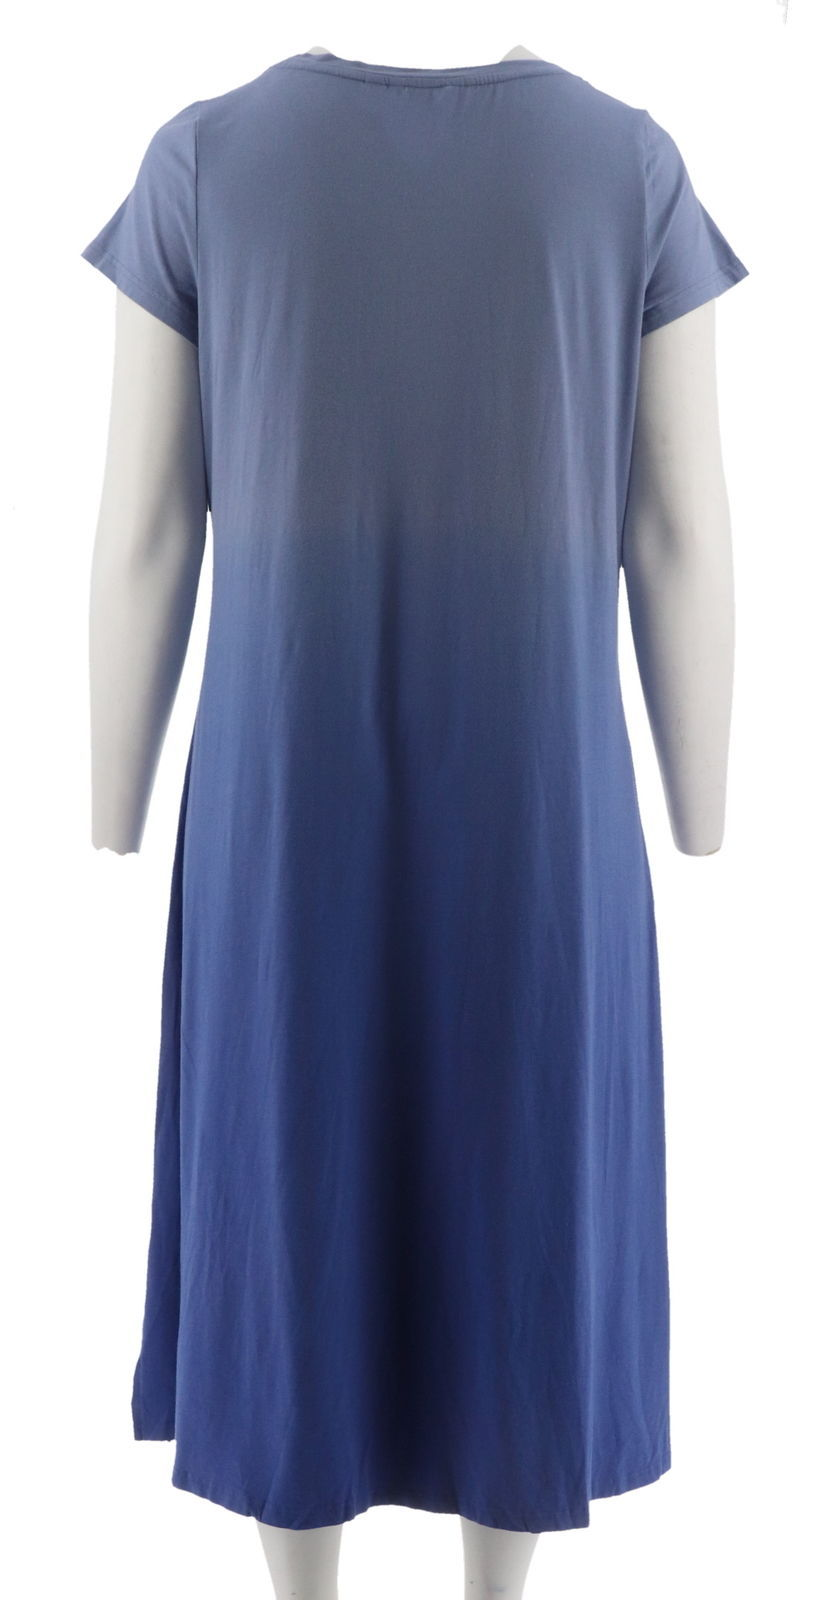 H Halston Short Slv Dip Dye Knit Midi Dress Purple Iris S NEW A289380 image 3